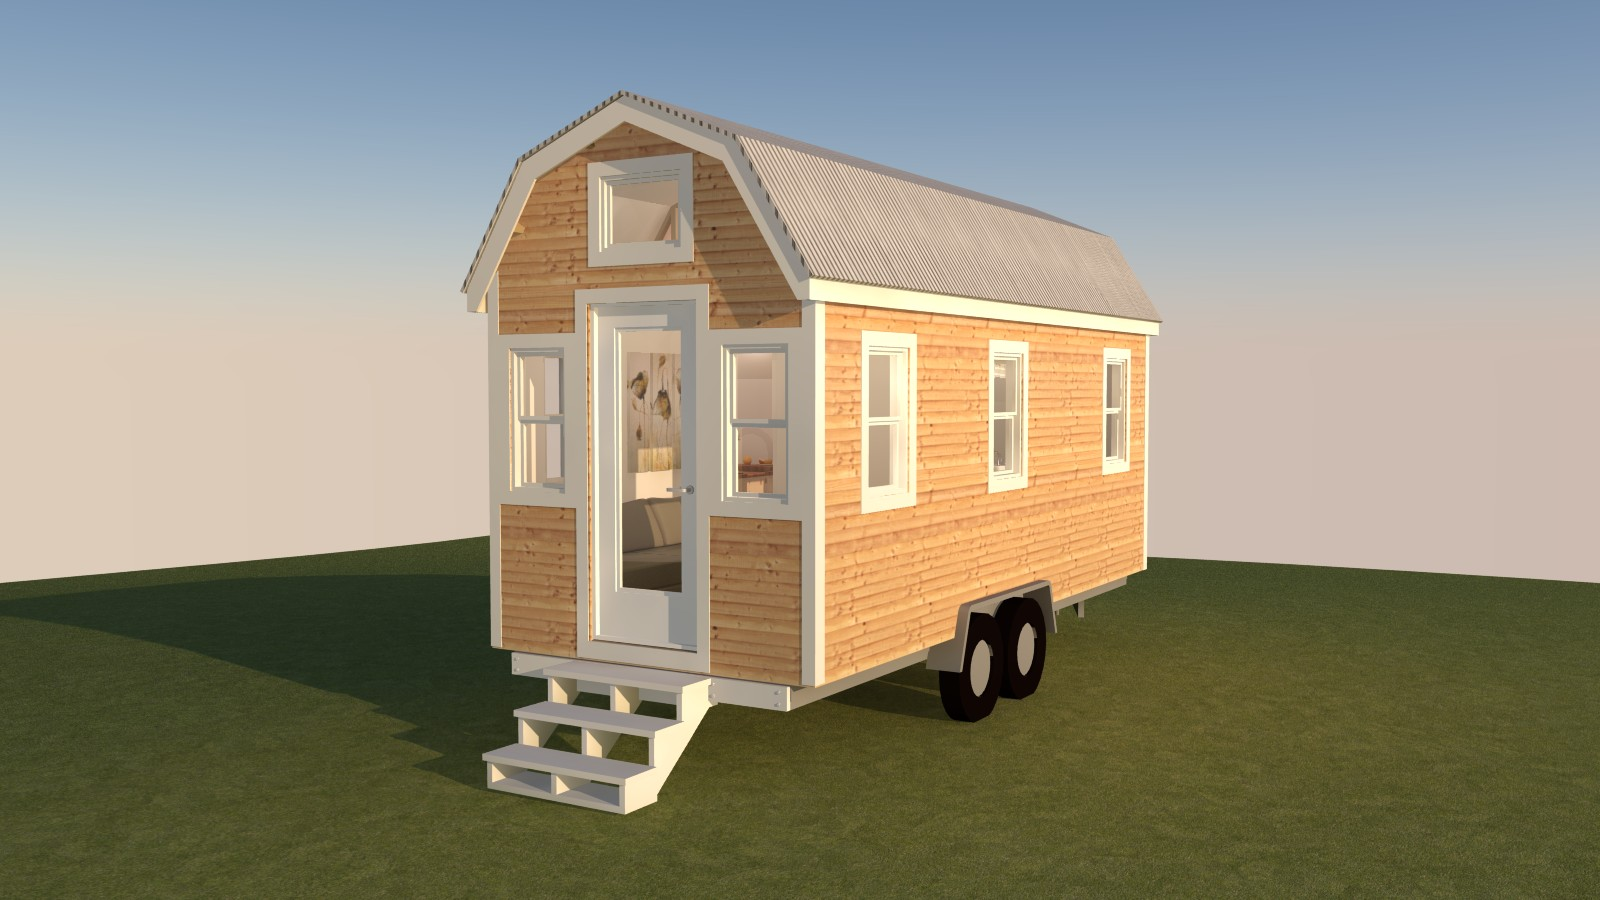 covelo 20 tiny house plans. Black Bedroom Furniture Sets. Home Design Ideas